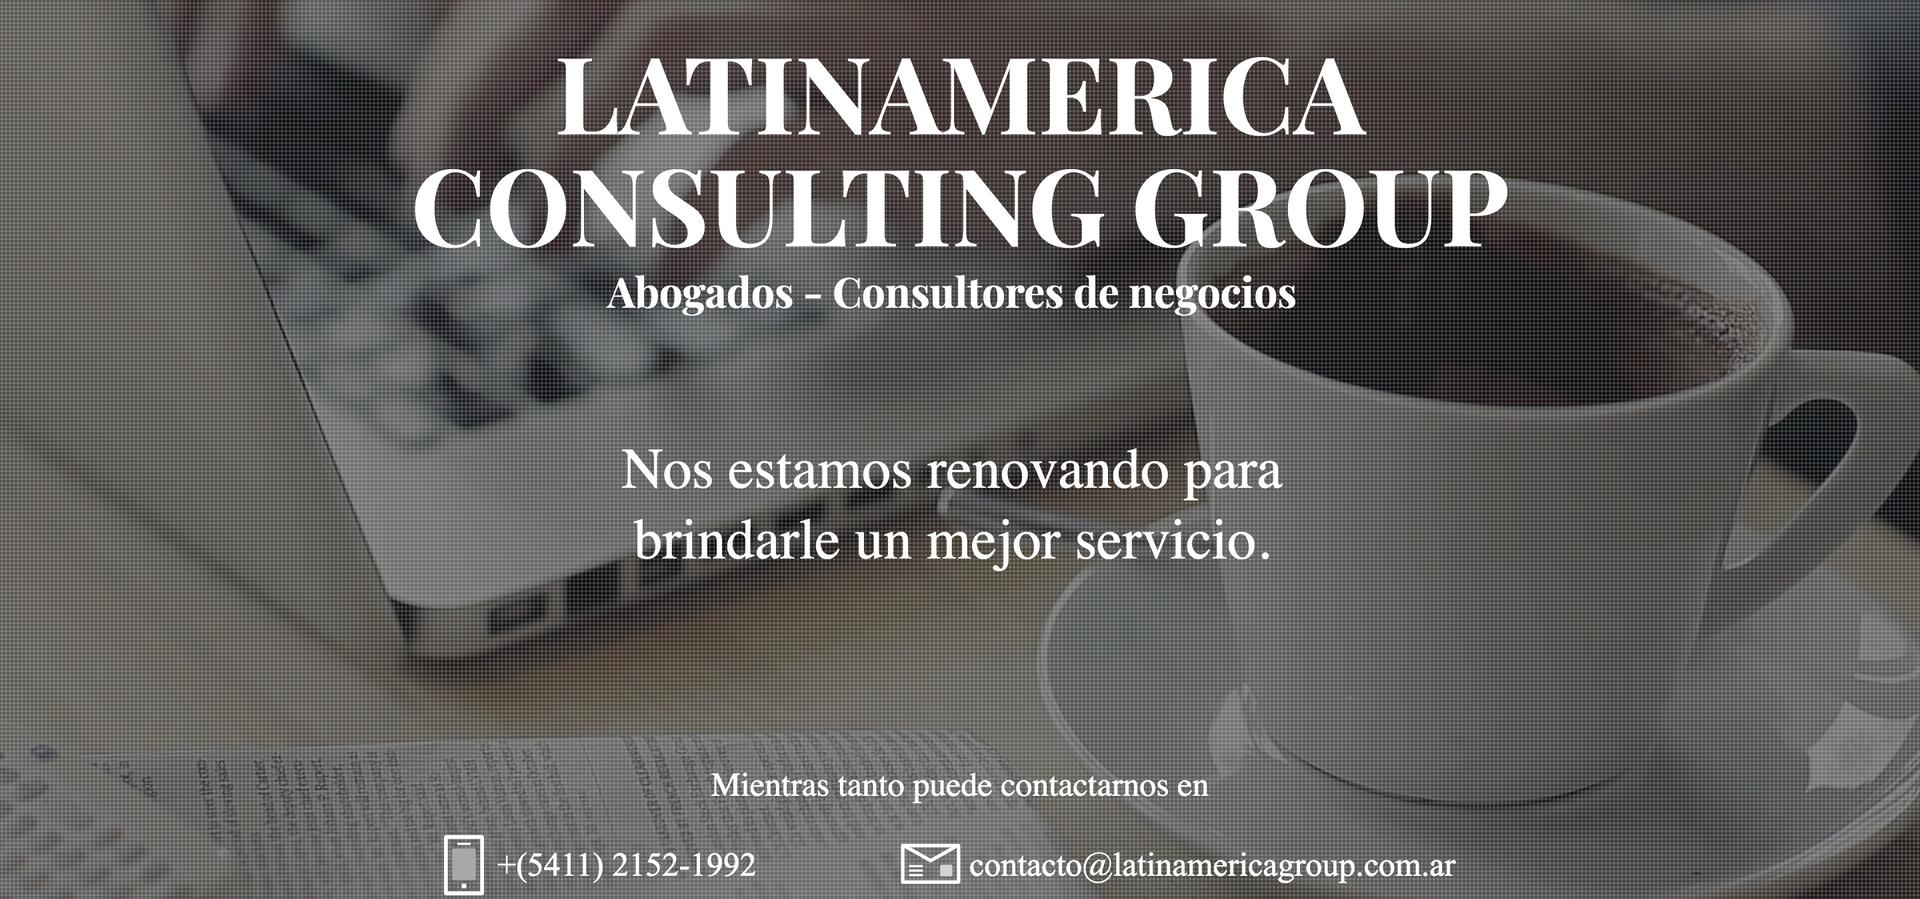 Latin America Consulting Group - Landing